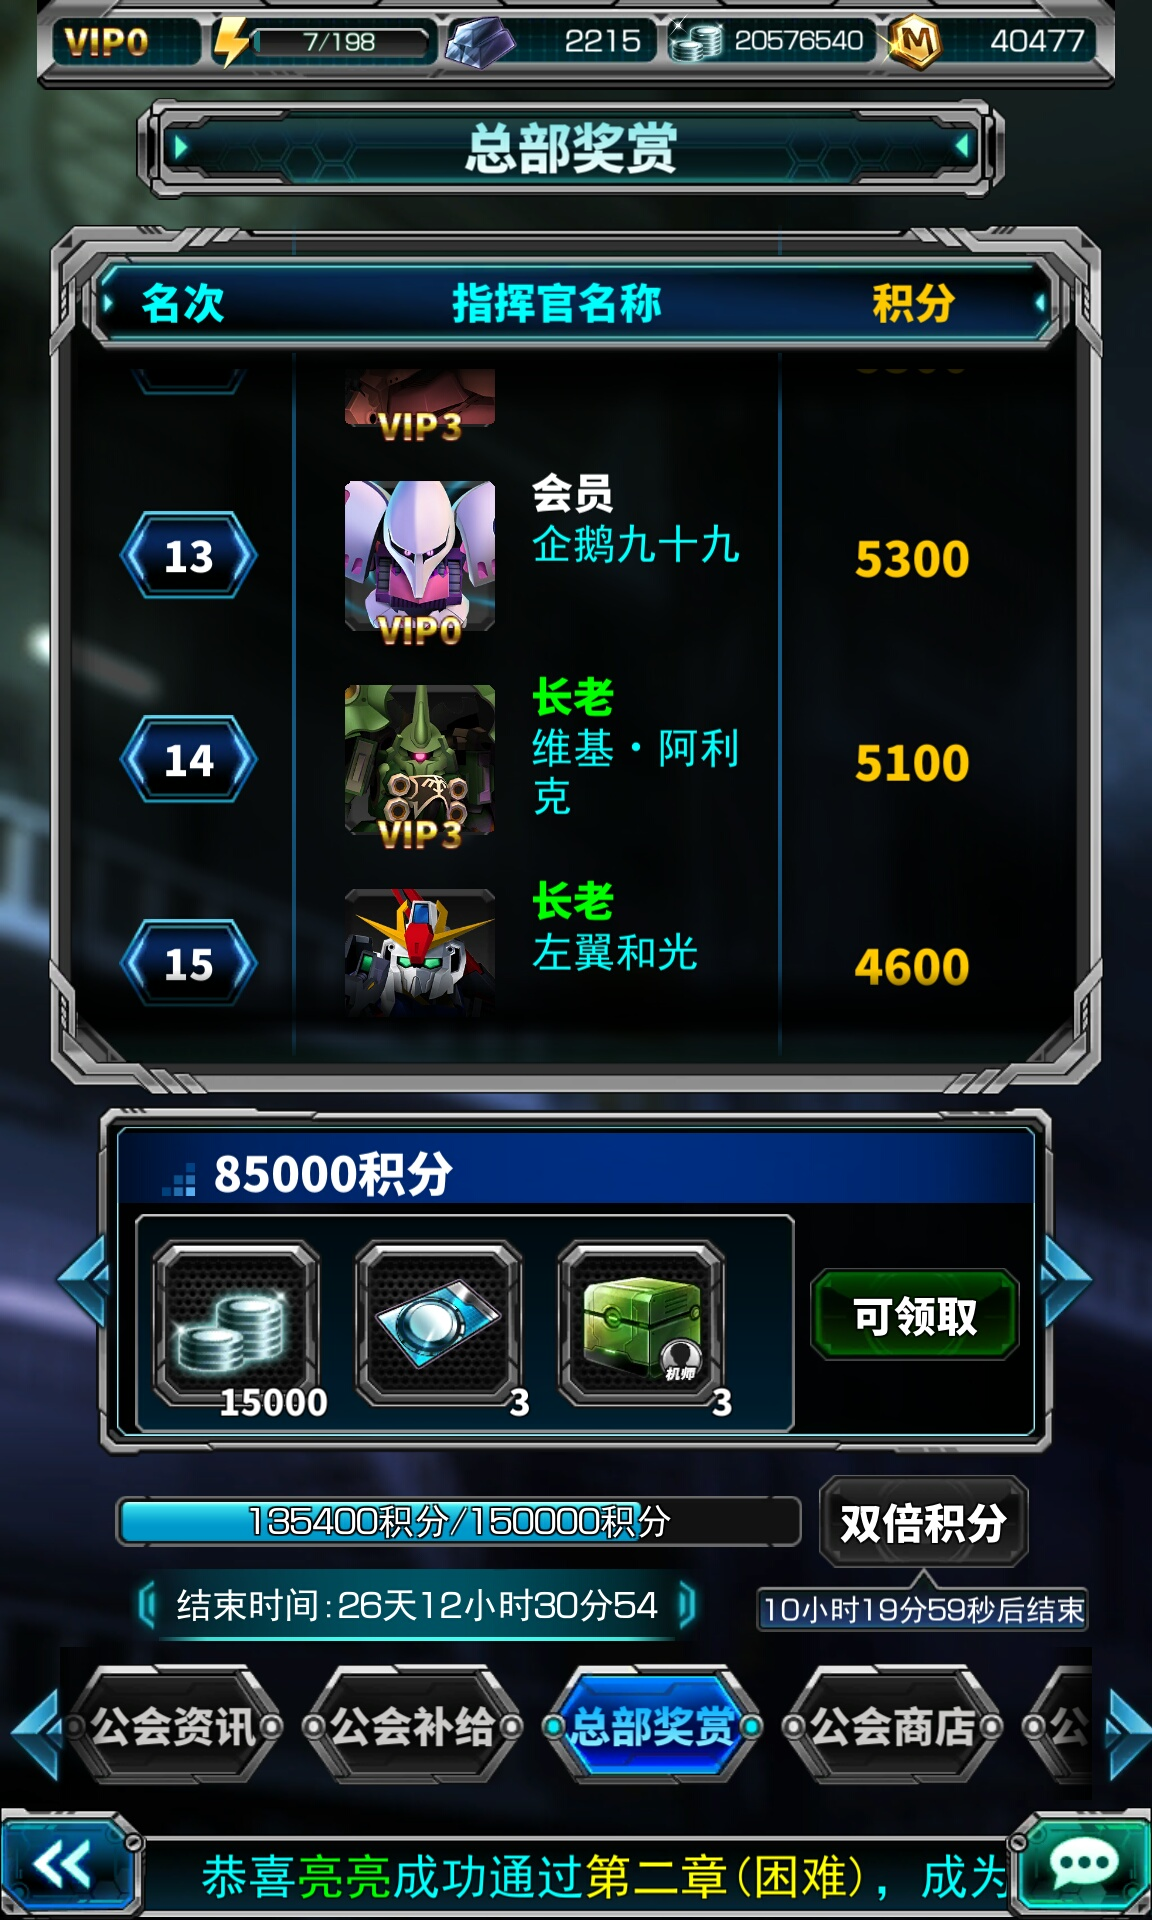 S80127-112908.jpg